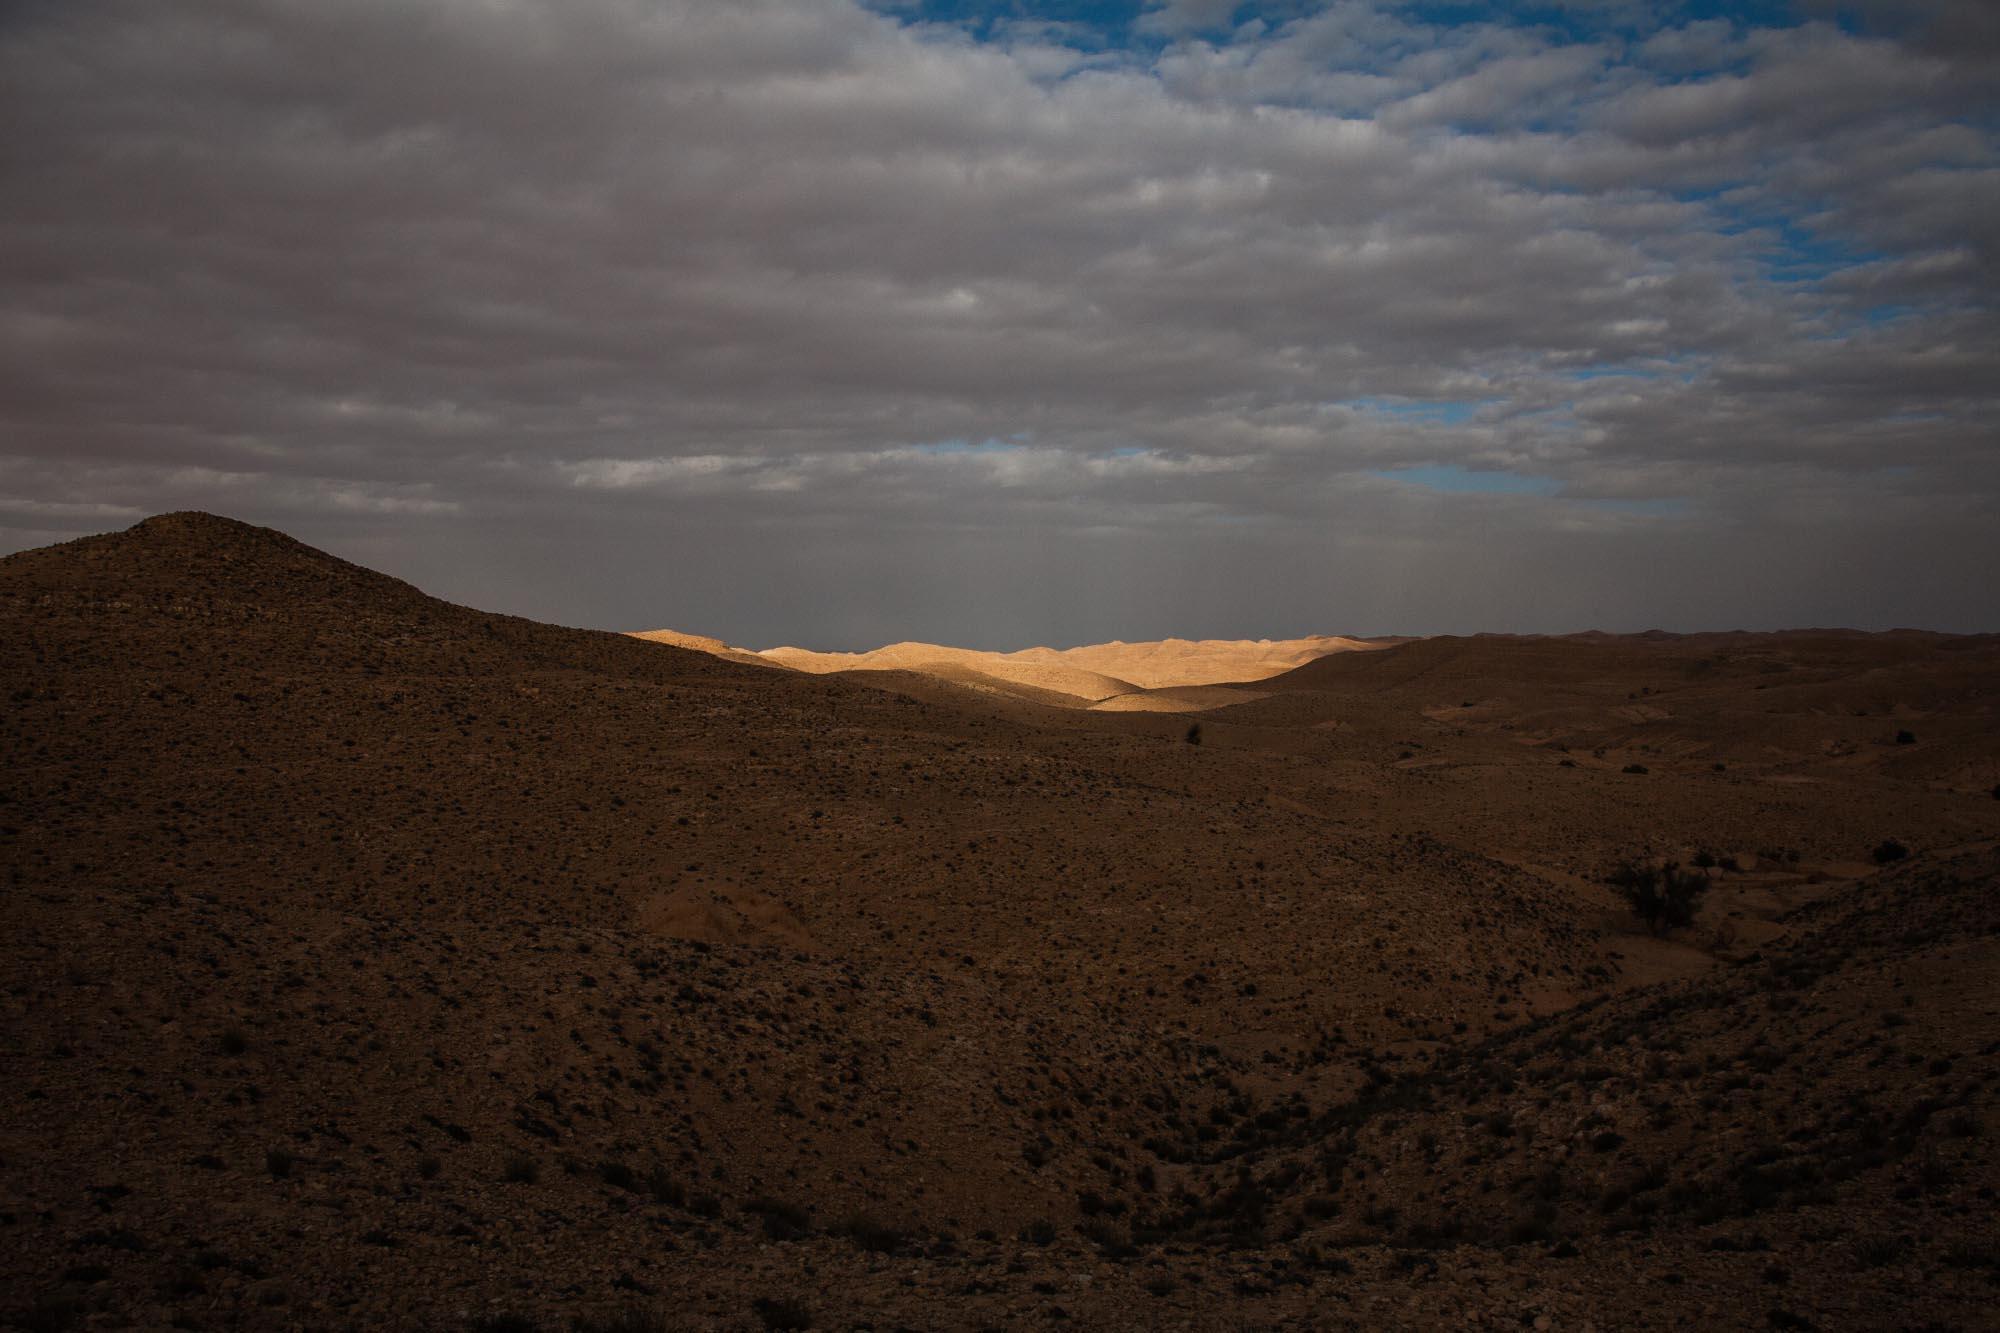 48-2012-TUNISIE-TOURISME©AUGUSTIN_LE-GALL_HAYTHAM-PICTURES-26-PATRIMOINE-TUNISIE©AUGUSTIN-LEGALL-_MG_3958.jpg